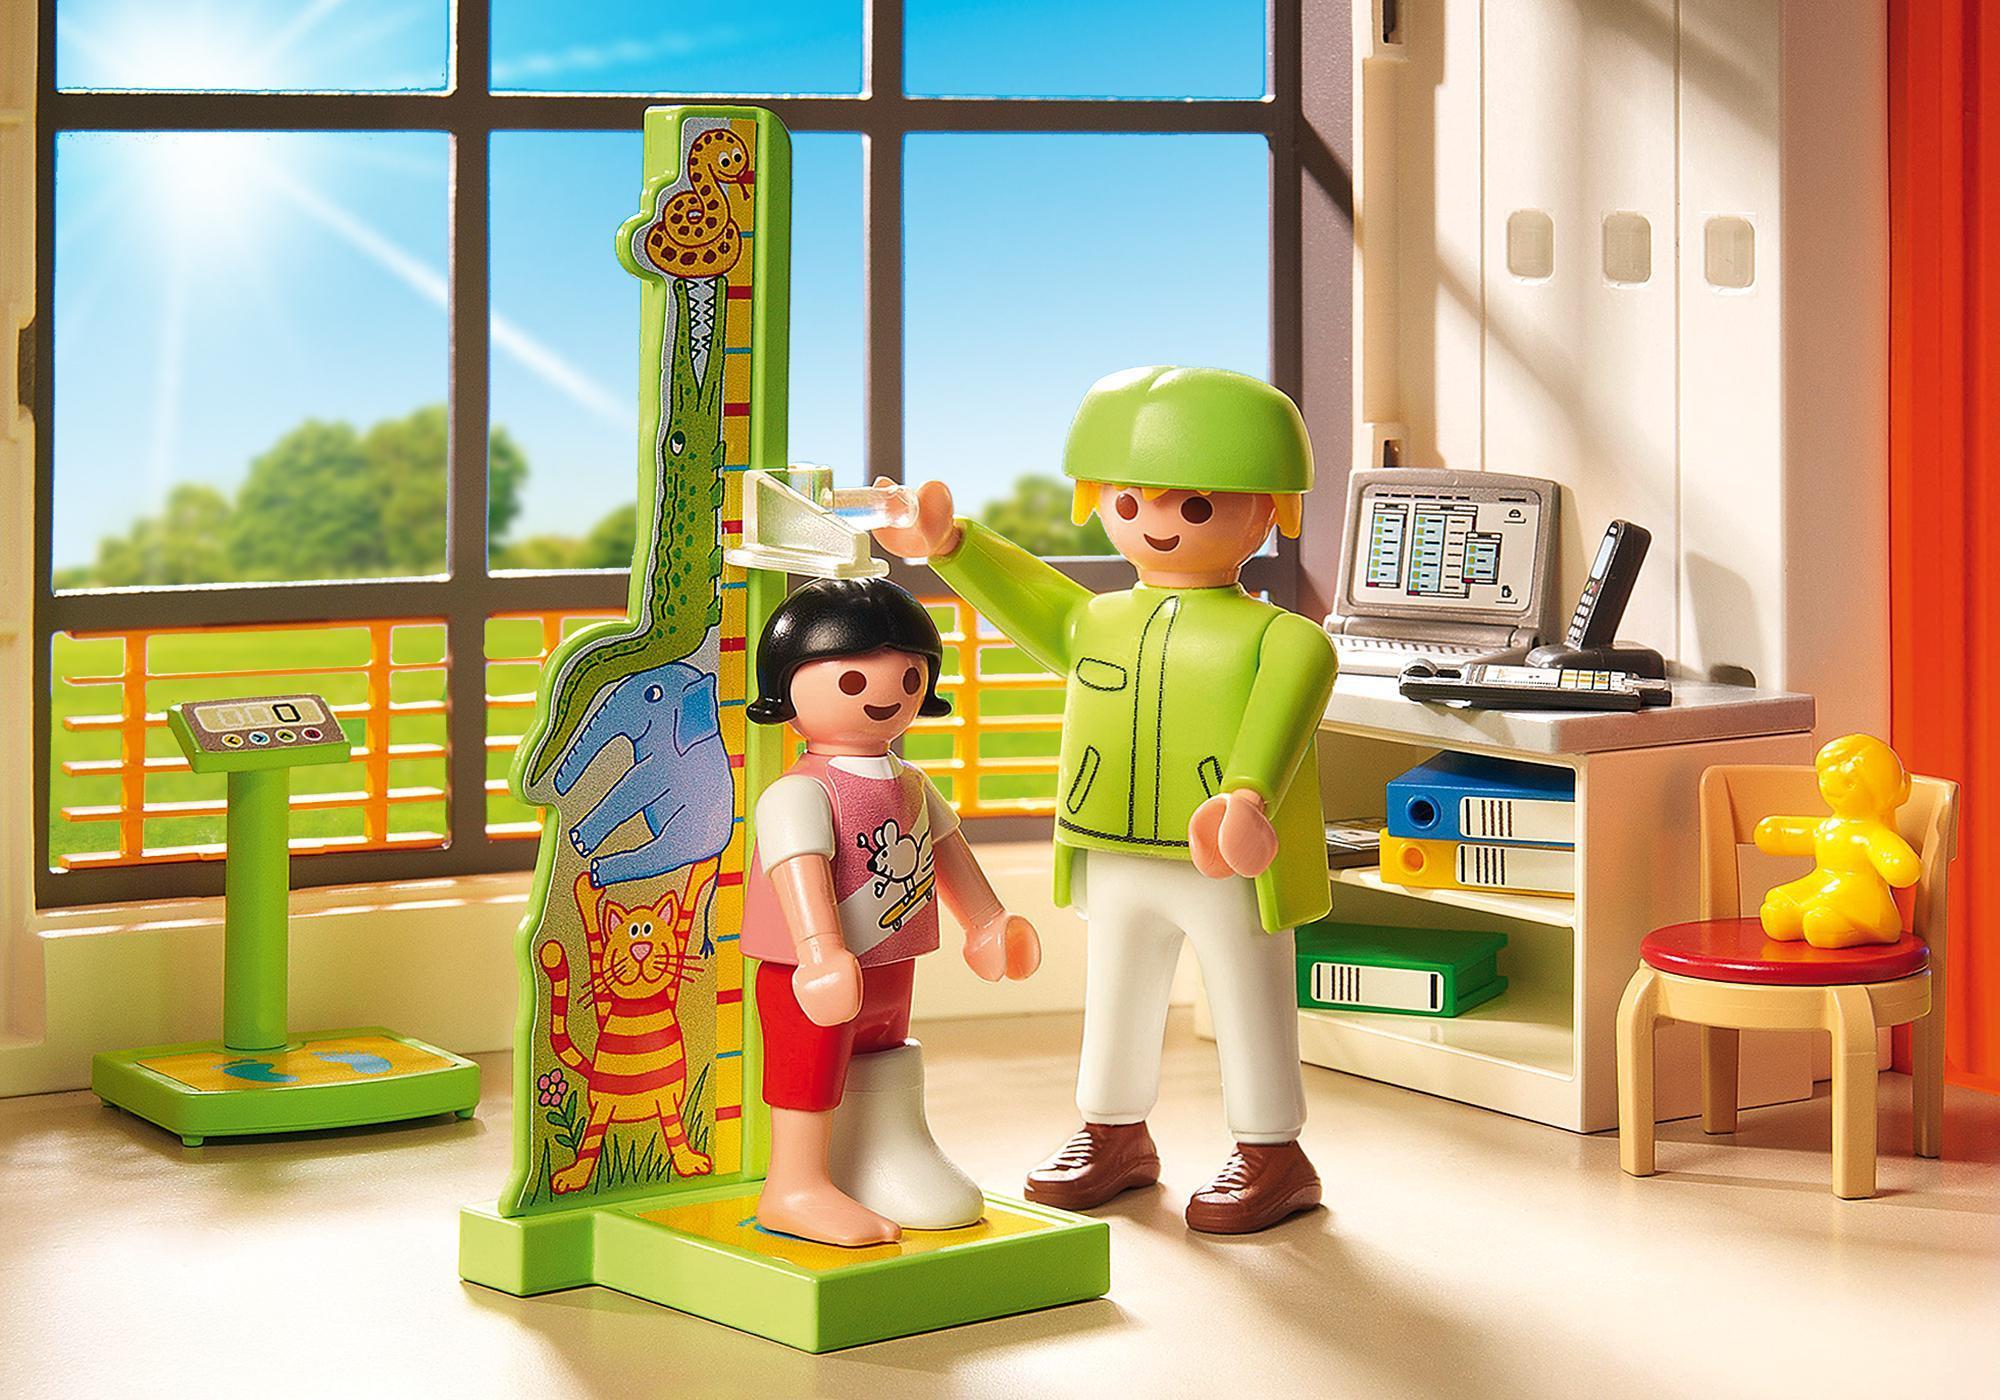 http://media.playmobil.com/i/playmobil/6657_product_extra2/Furnished Children's Hospital